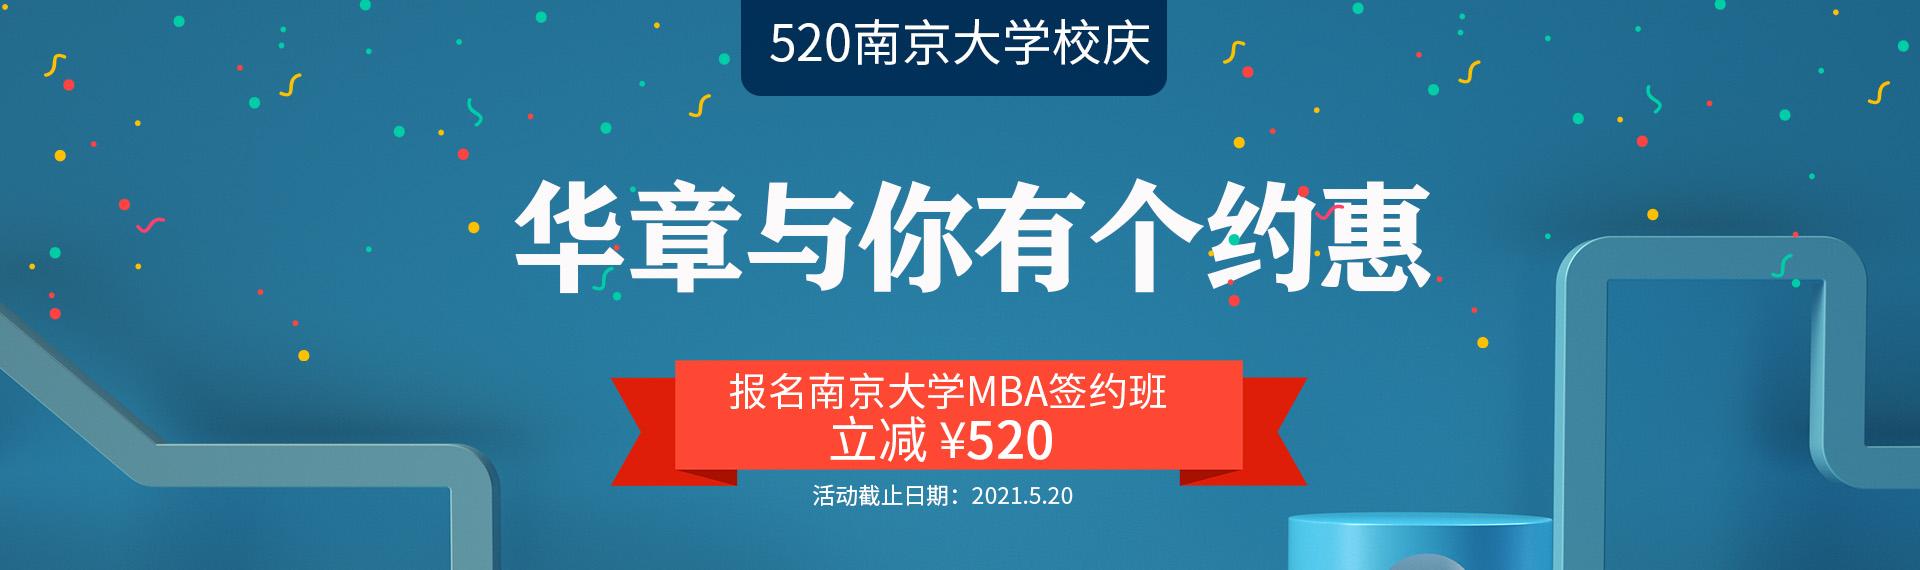 /uploads/image/2021/05/18/520南大校庆.jpg